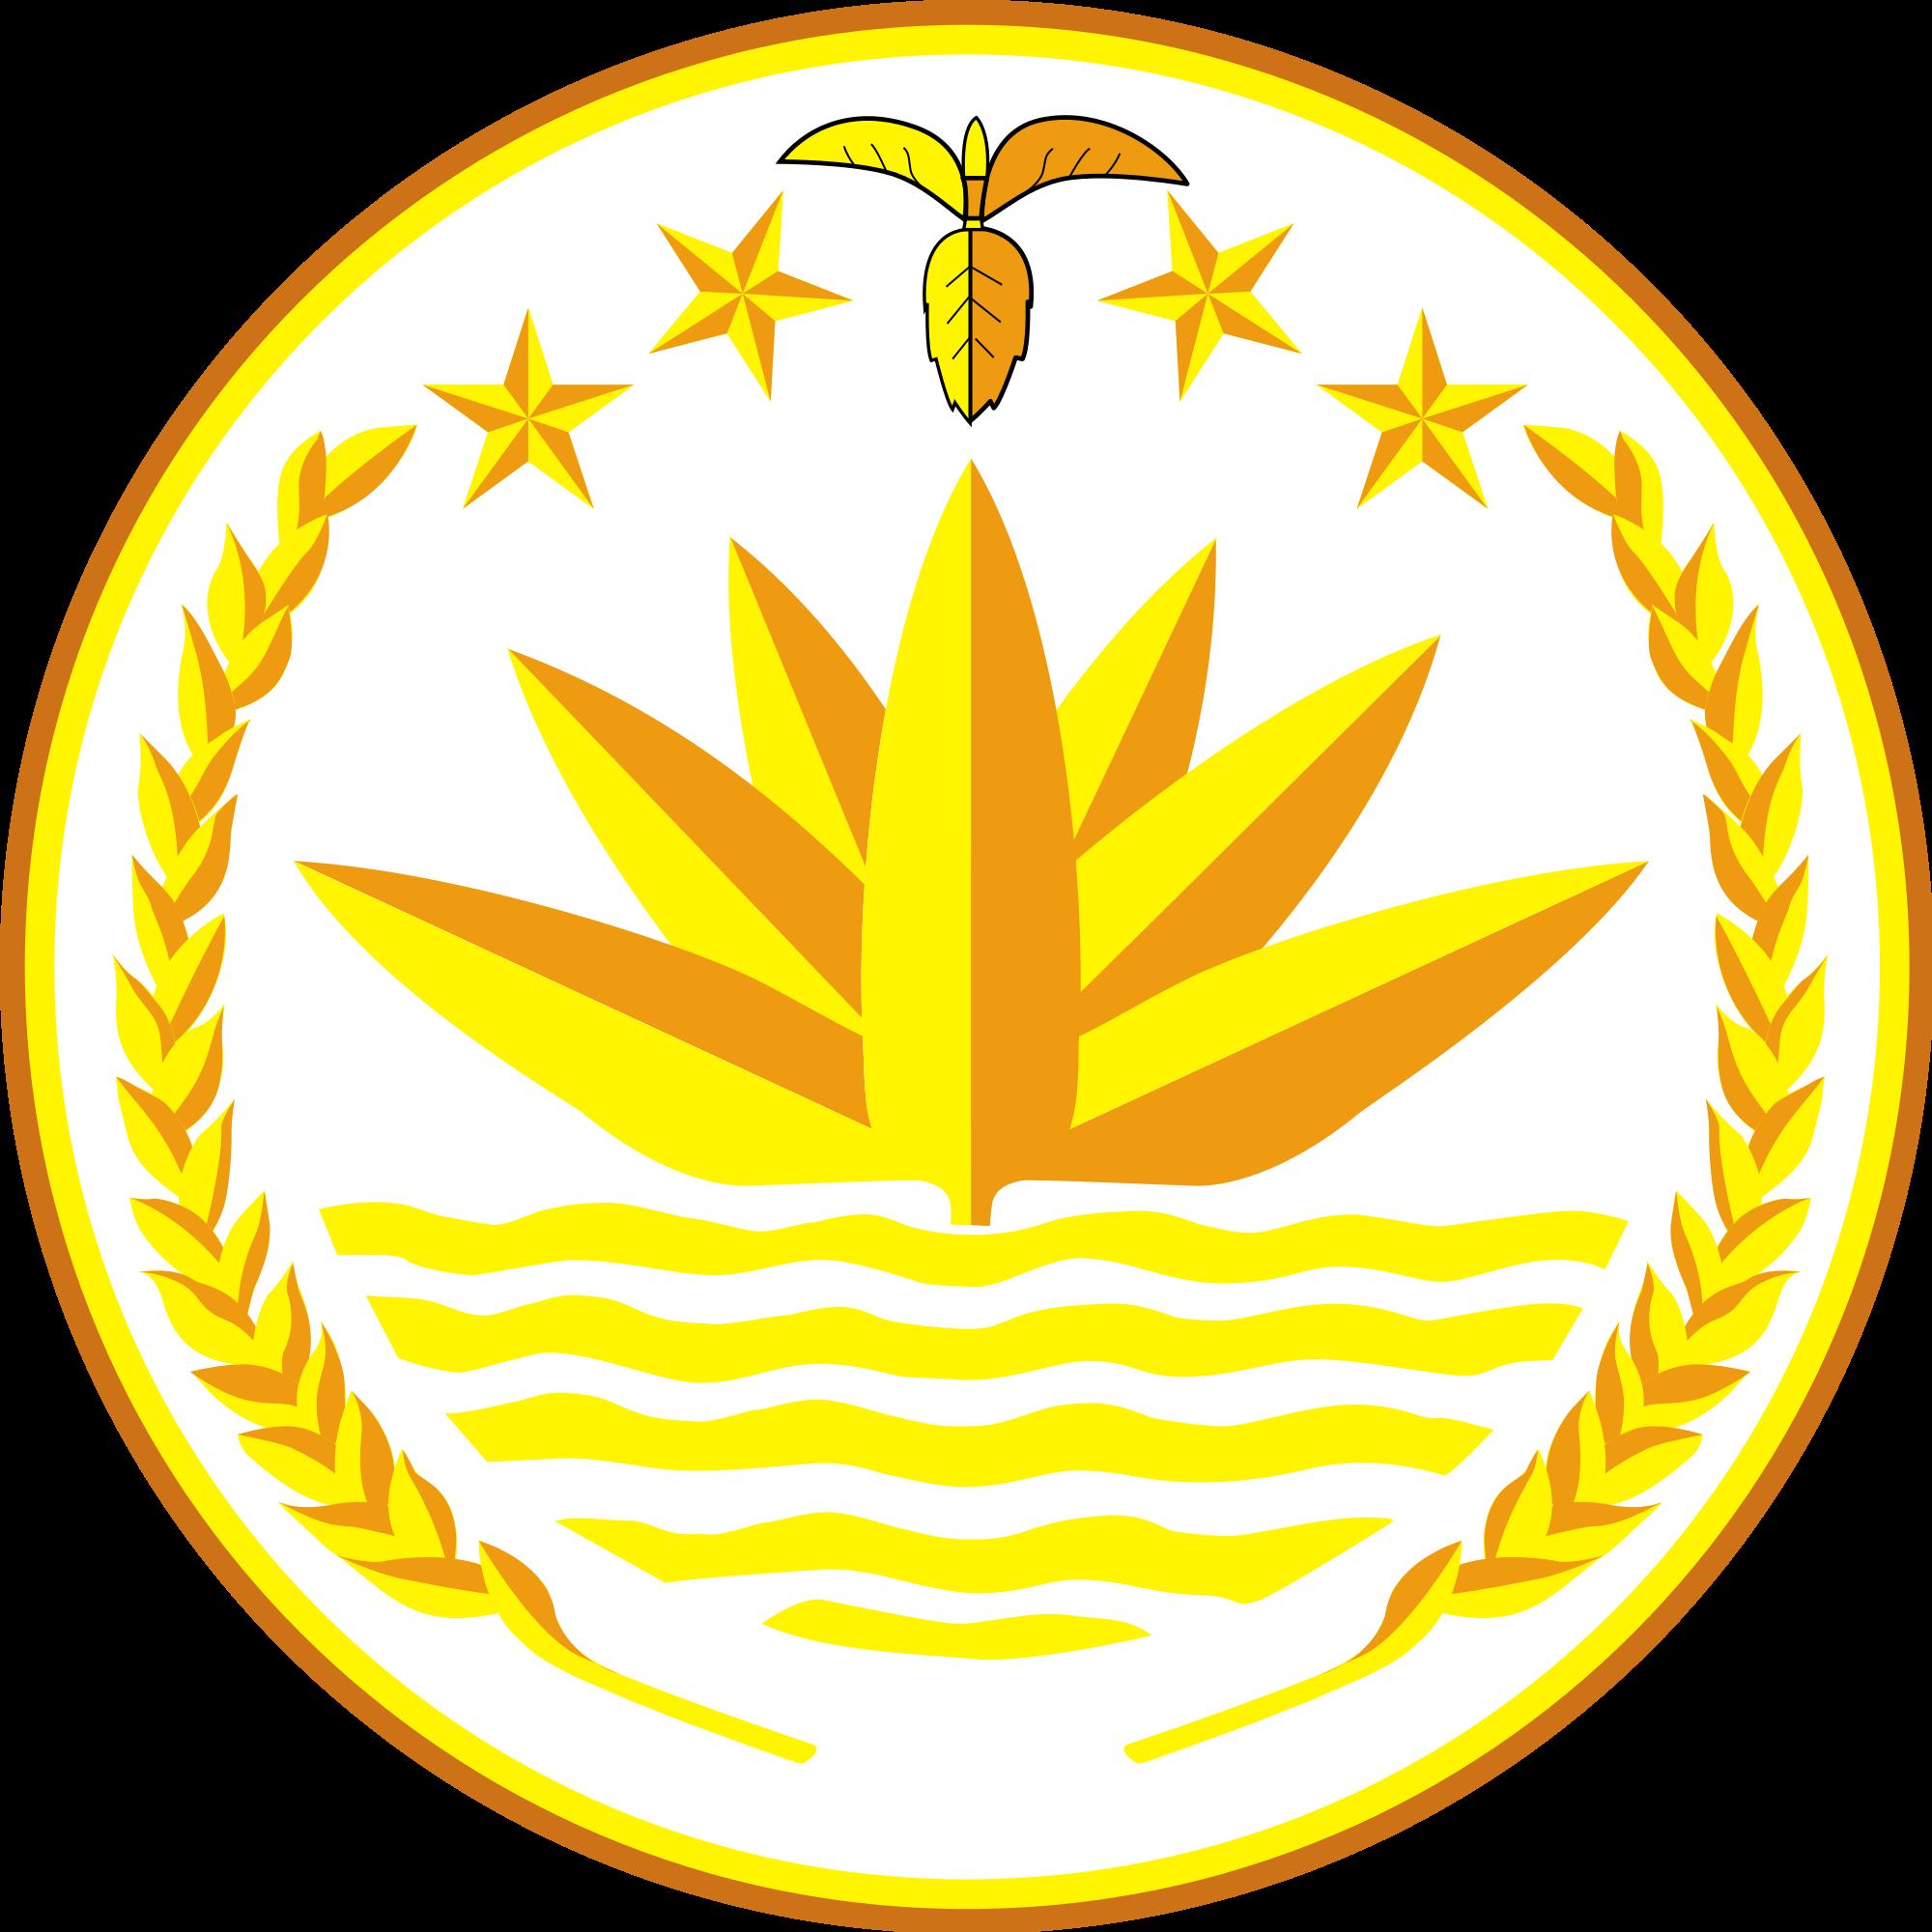 National Emblem of Bangladesh.